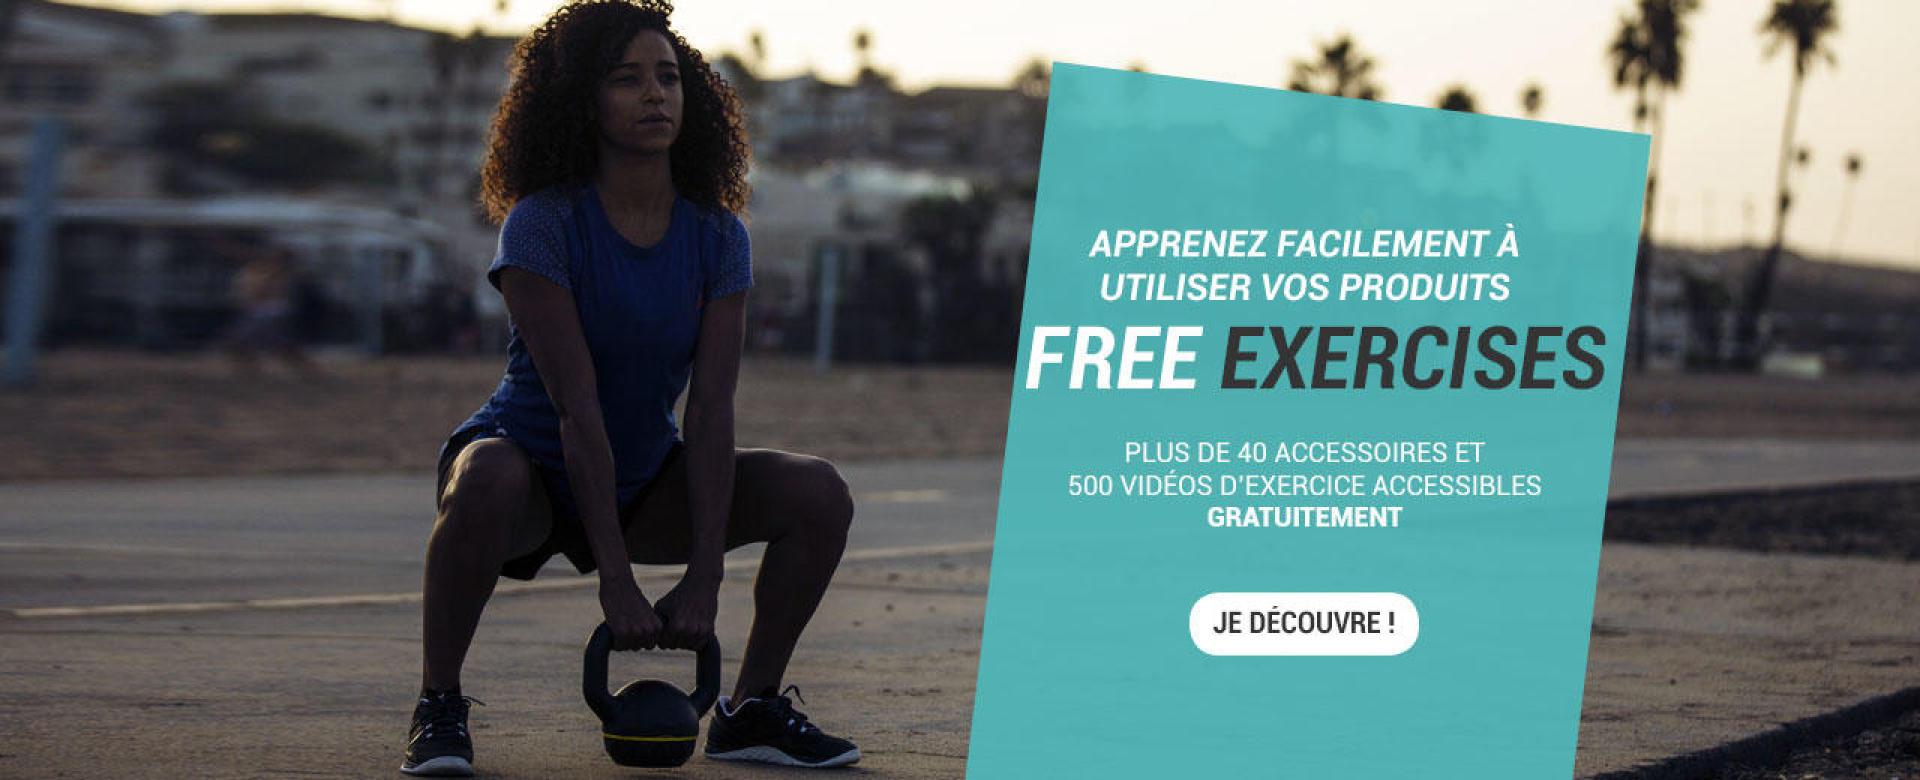 domyos pays slideshow free-exercice fr